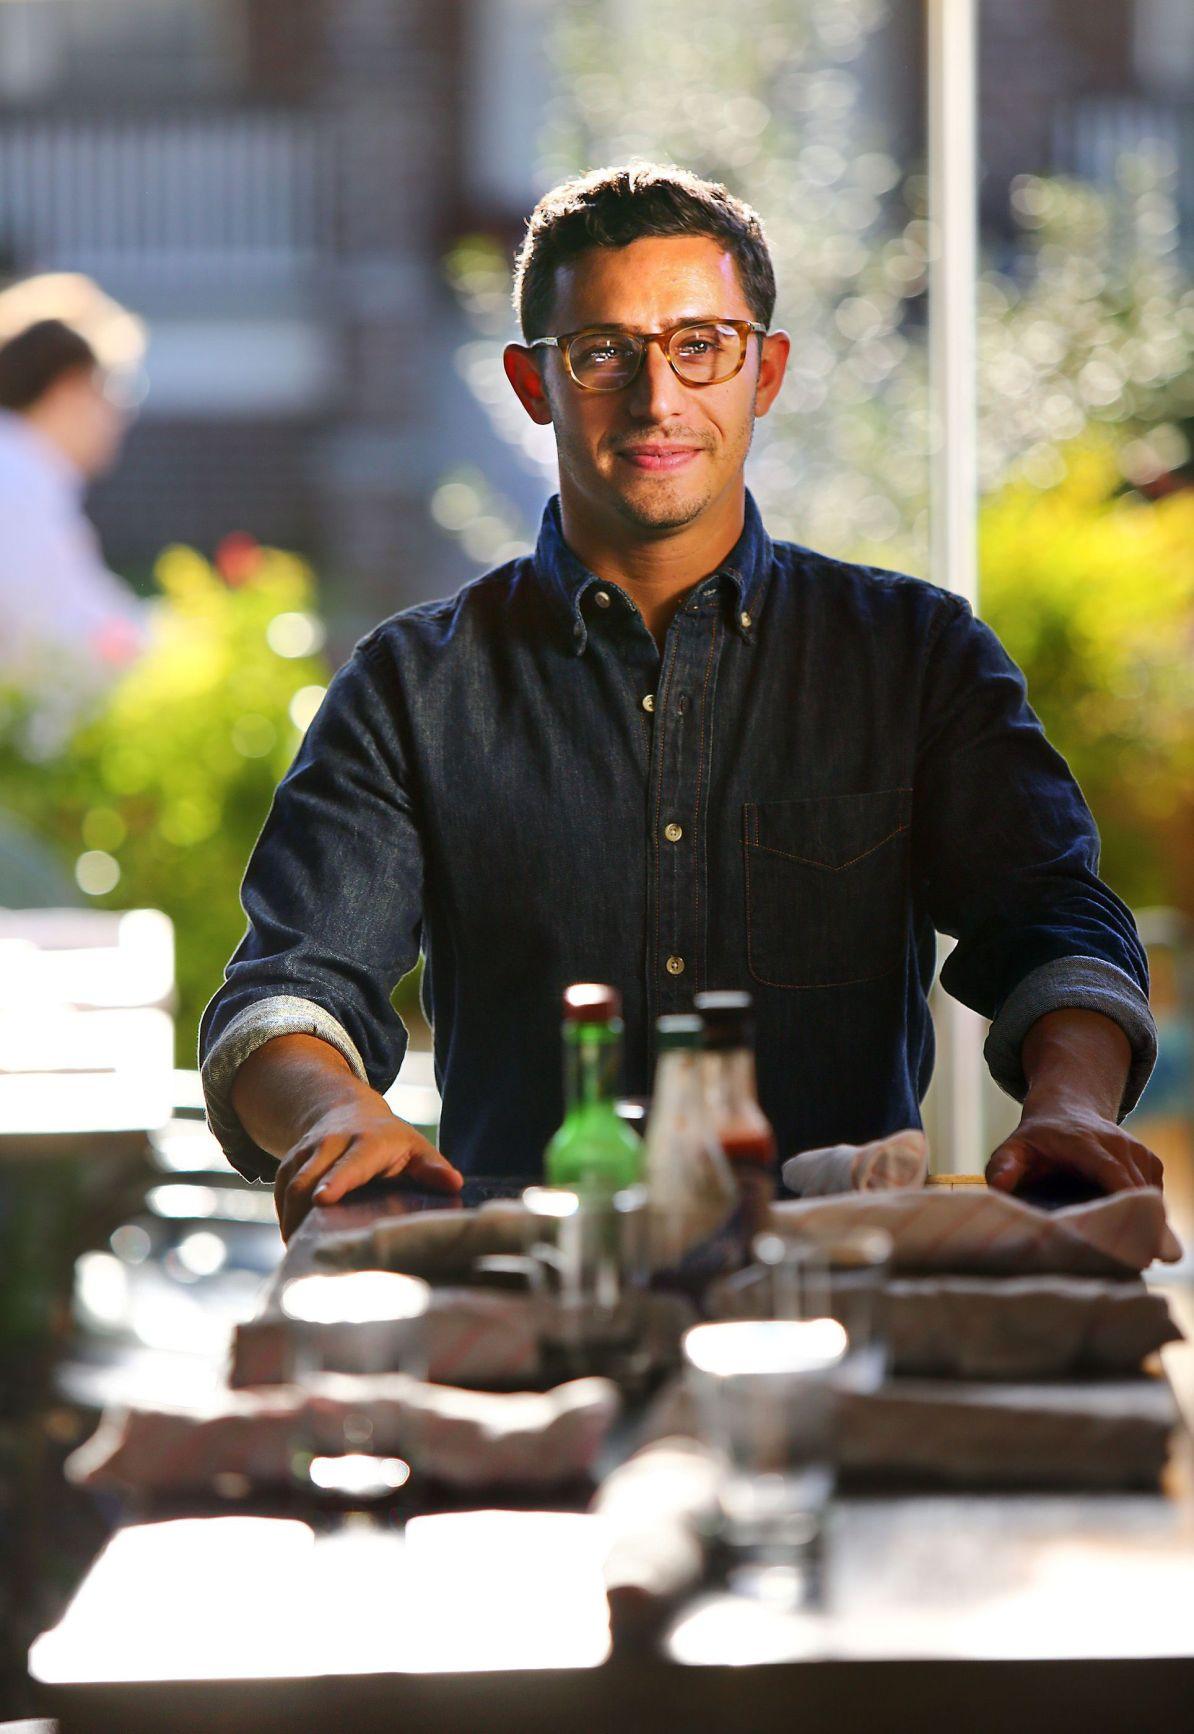 Charleston supplies 11 semi-finalists for James Beard awards